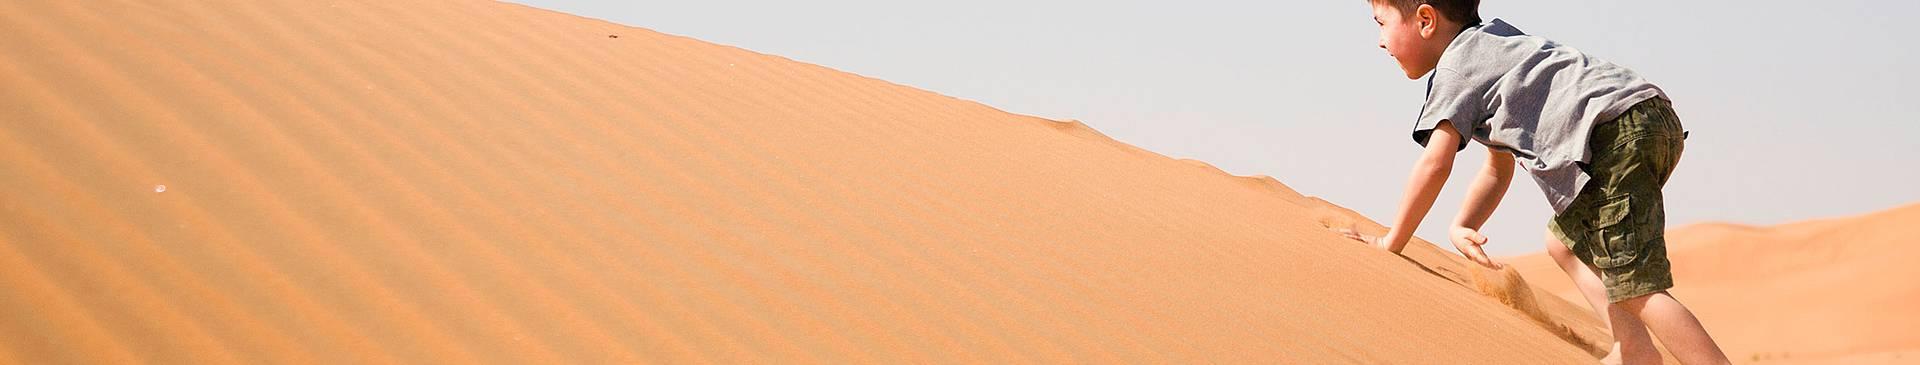 Marokko Reisen mit Kindern